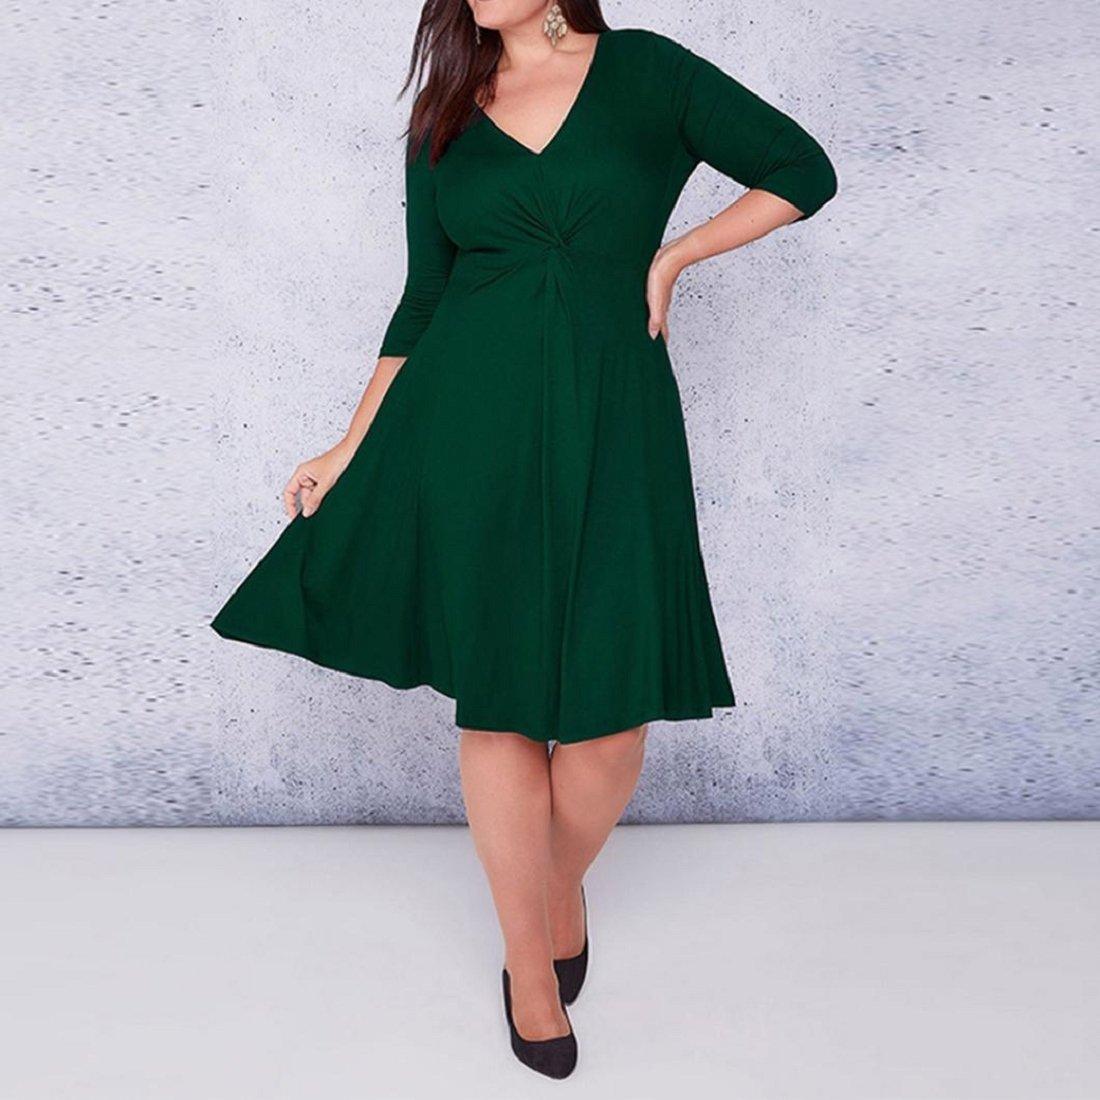 Amazon.com  GONKOMA Women s Plus Size Dress Casual Three Quarter Sleeve  V-Neck Plain Loose T-Shirt Party Dress XL-6XL  Clothing cec636c8c8c6